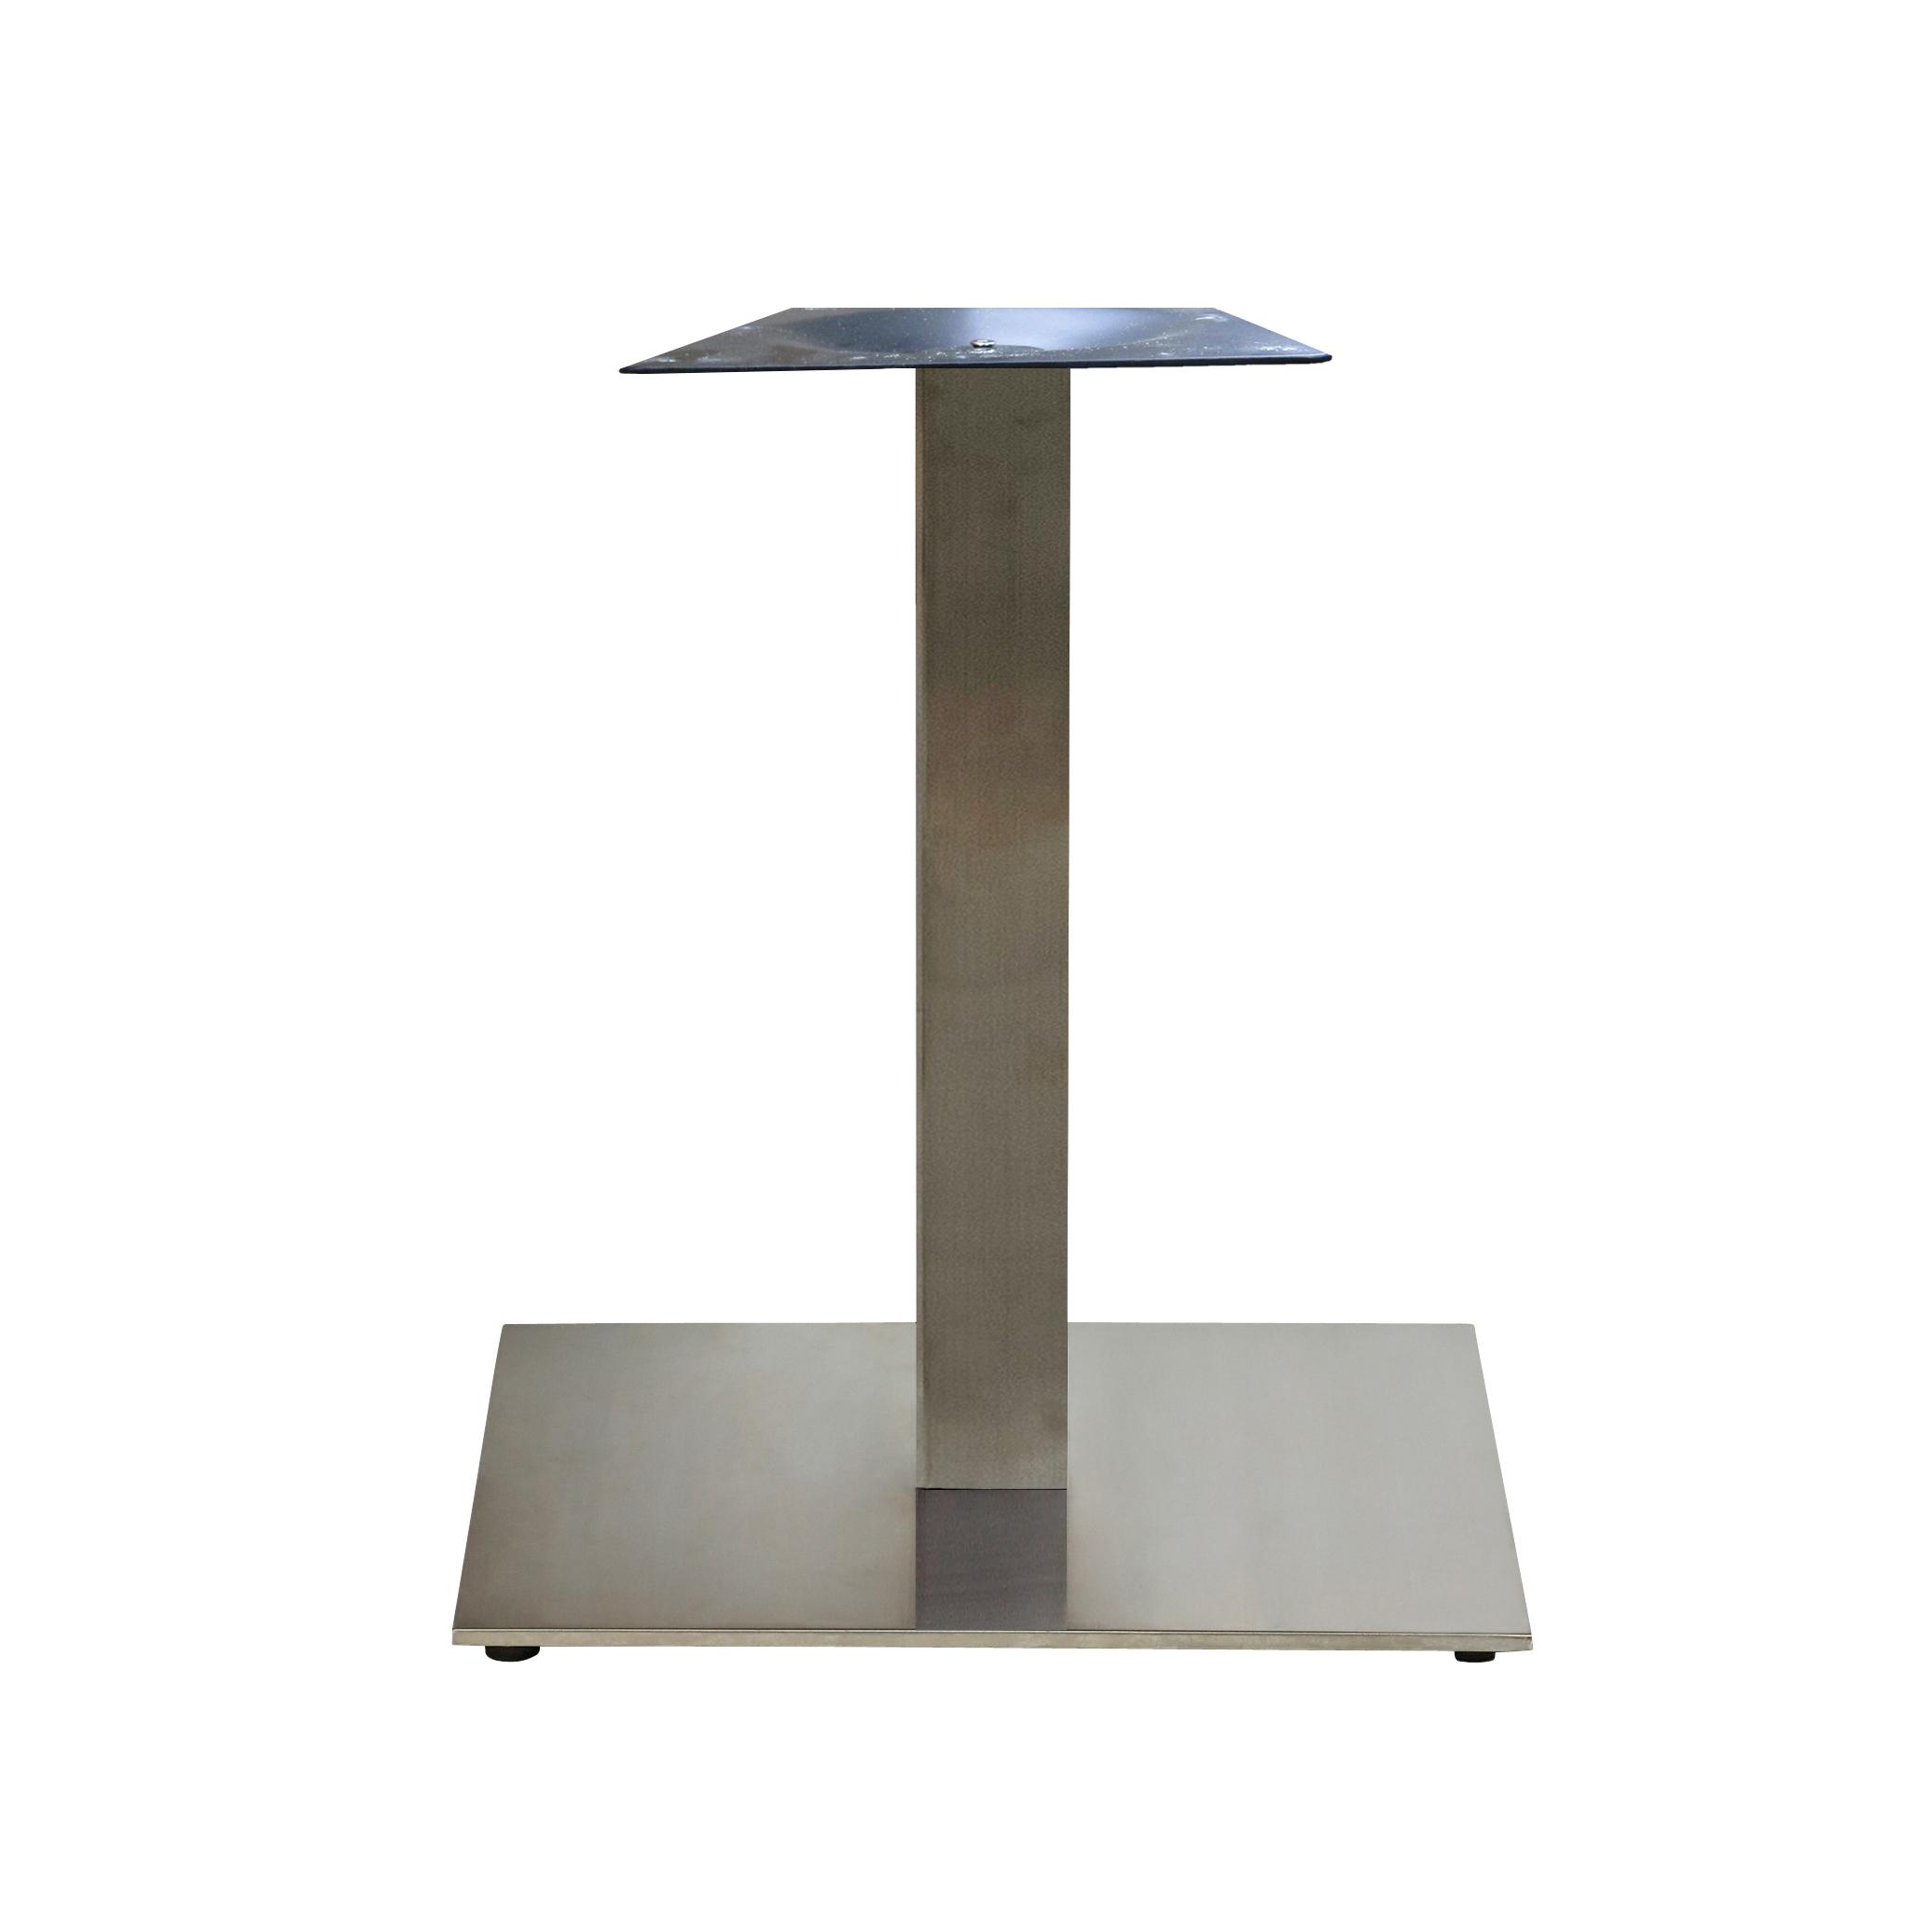 Grosfillex US518009 table base, metal